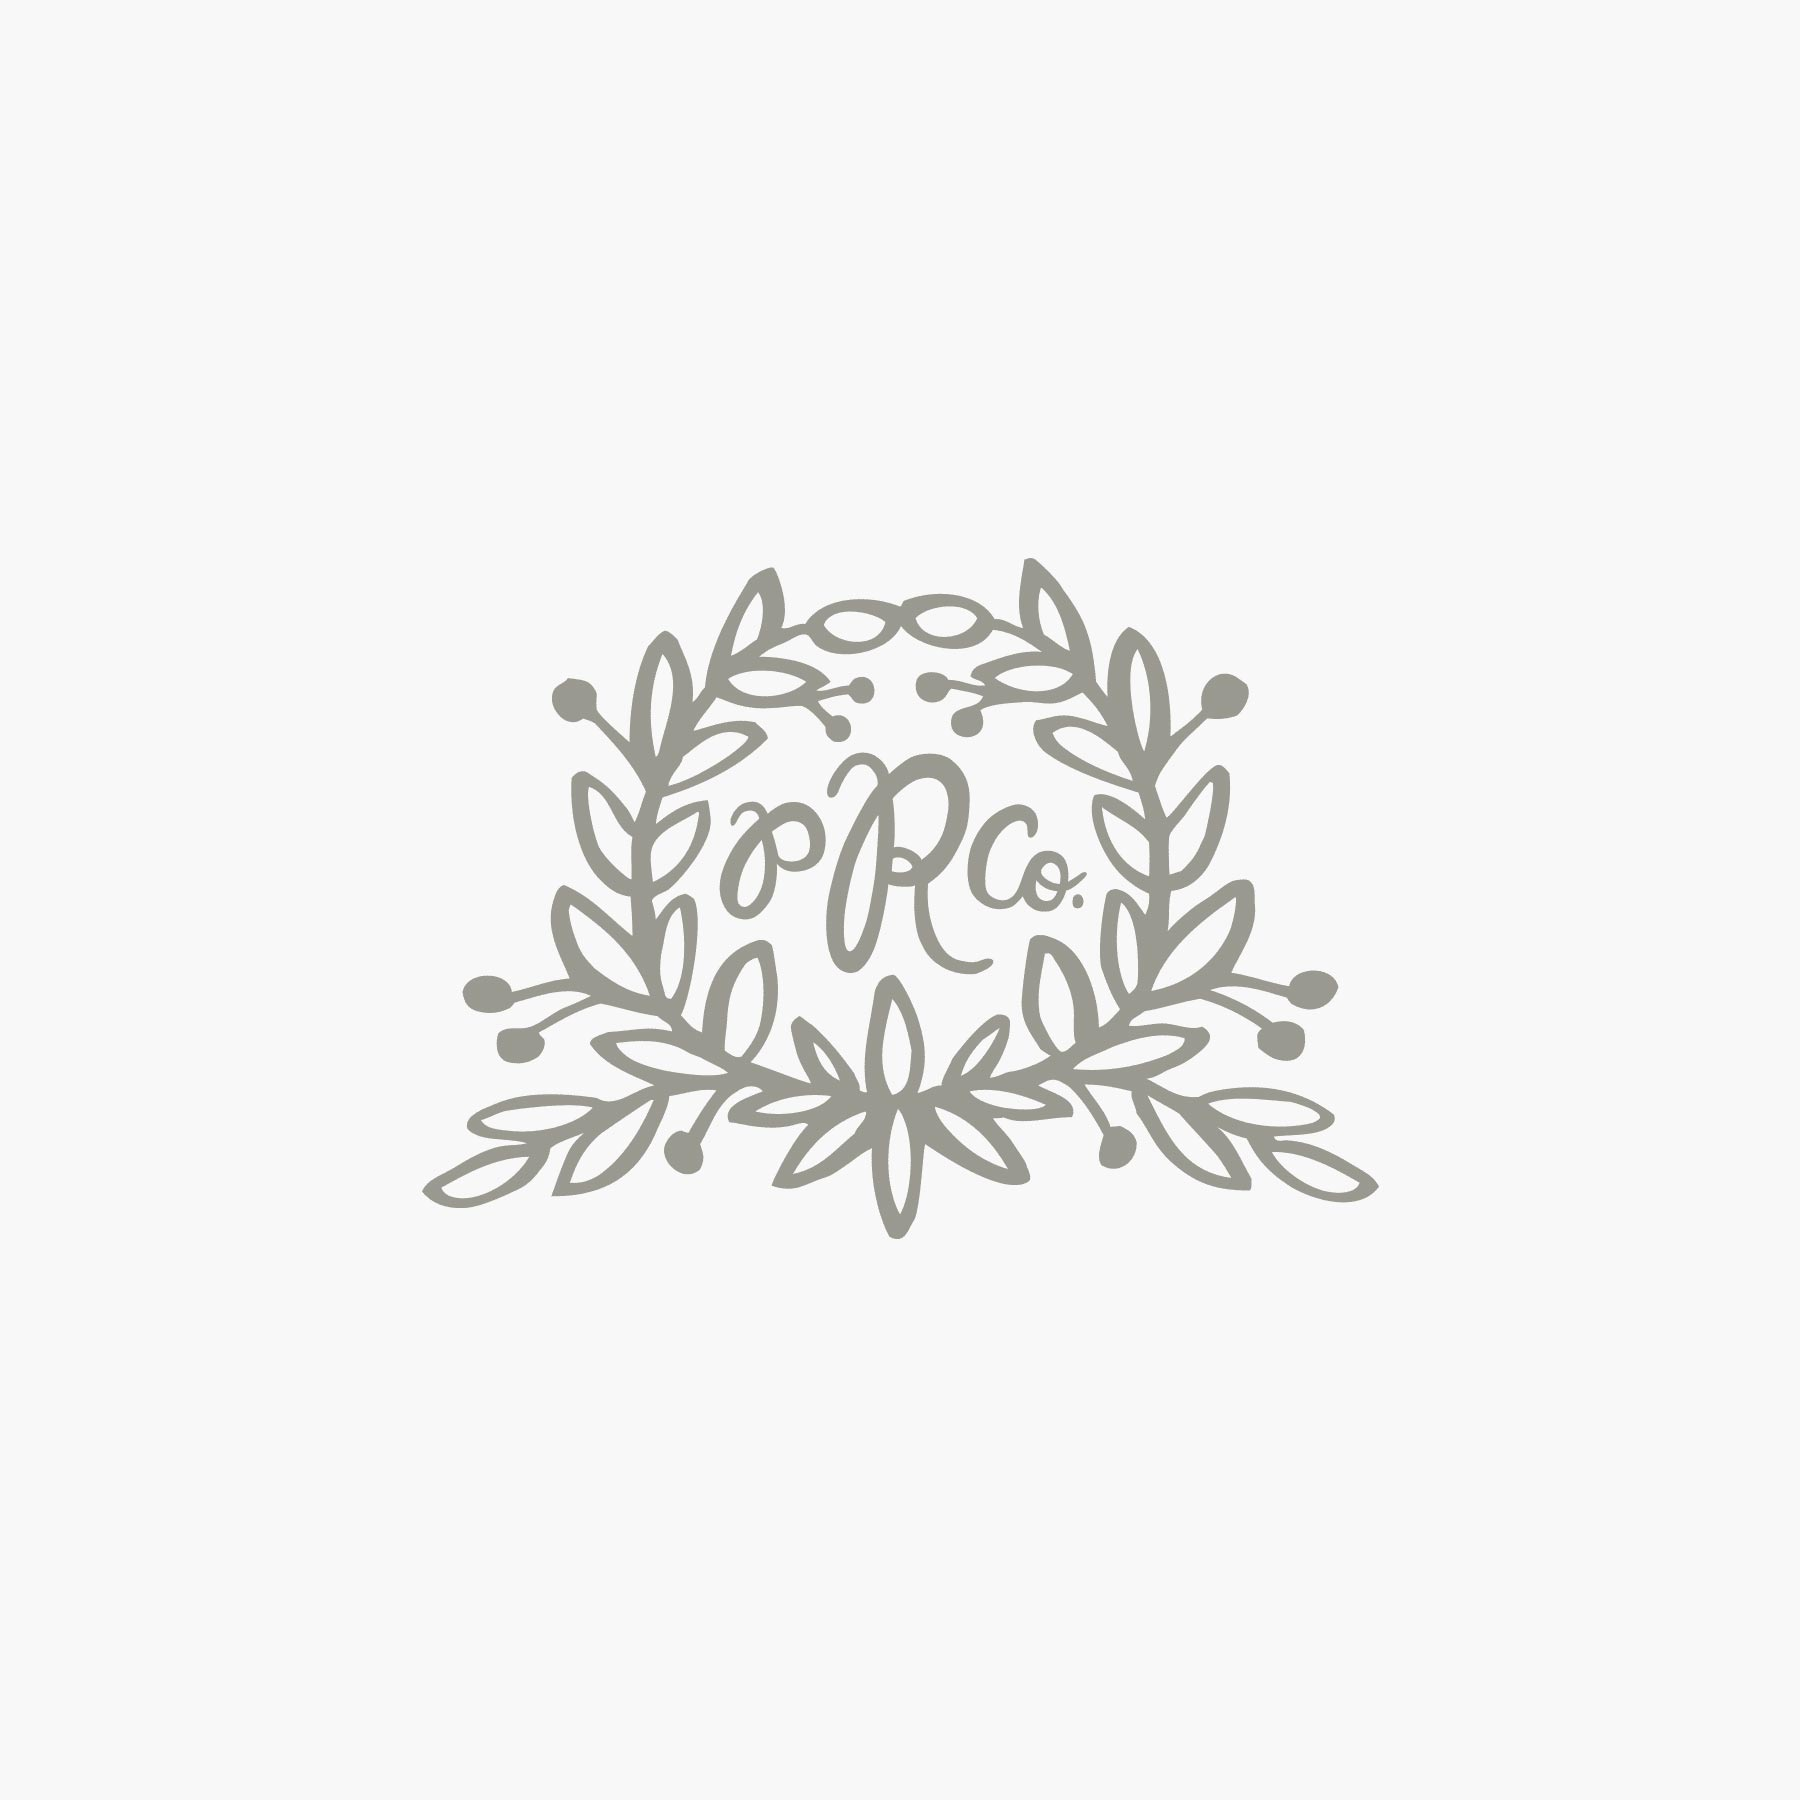 Accent Personalized Business Cards- Citrus Floral